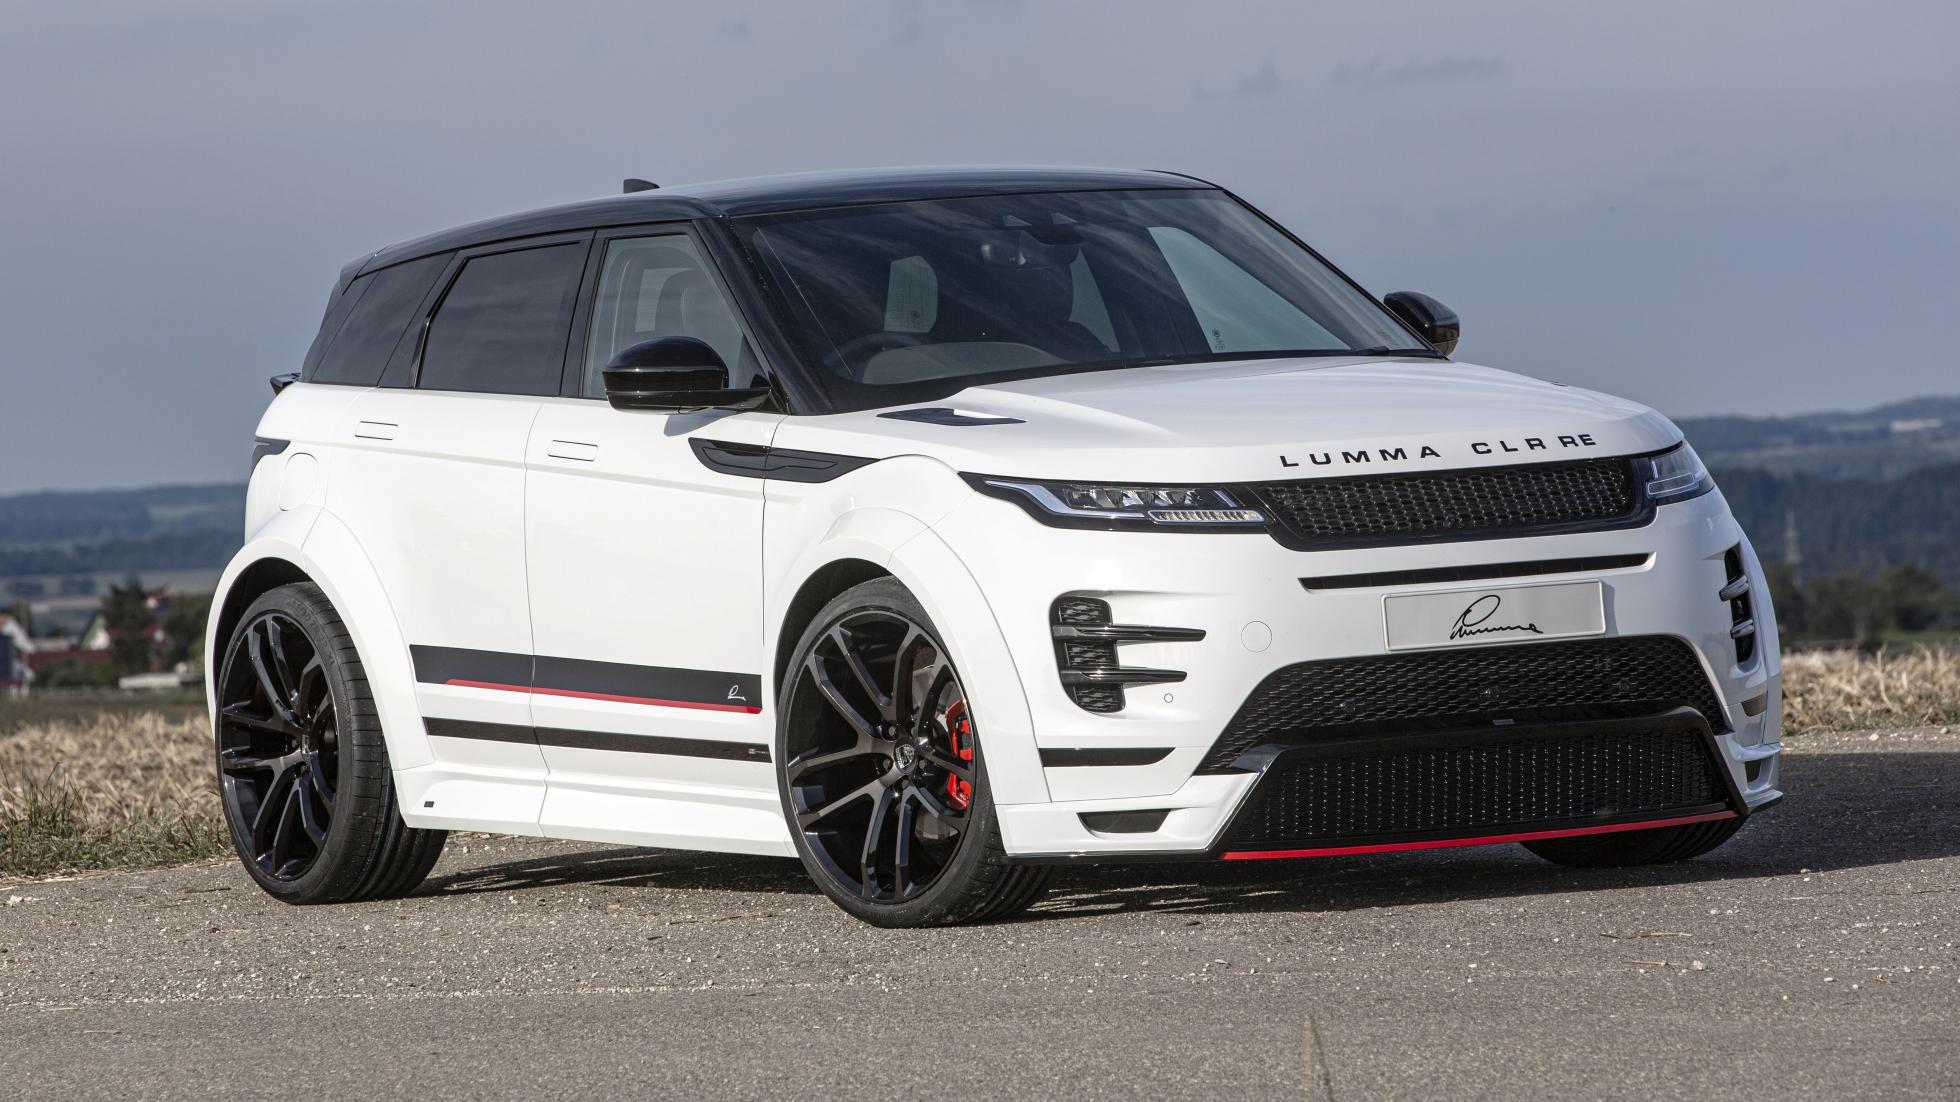 Range-Rover-Evoque-by-Lumma-Design-2